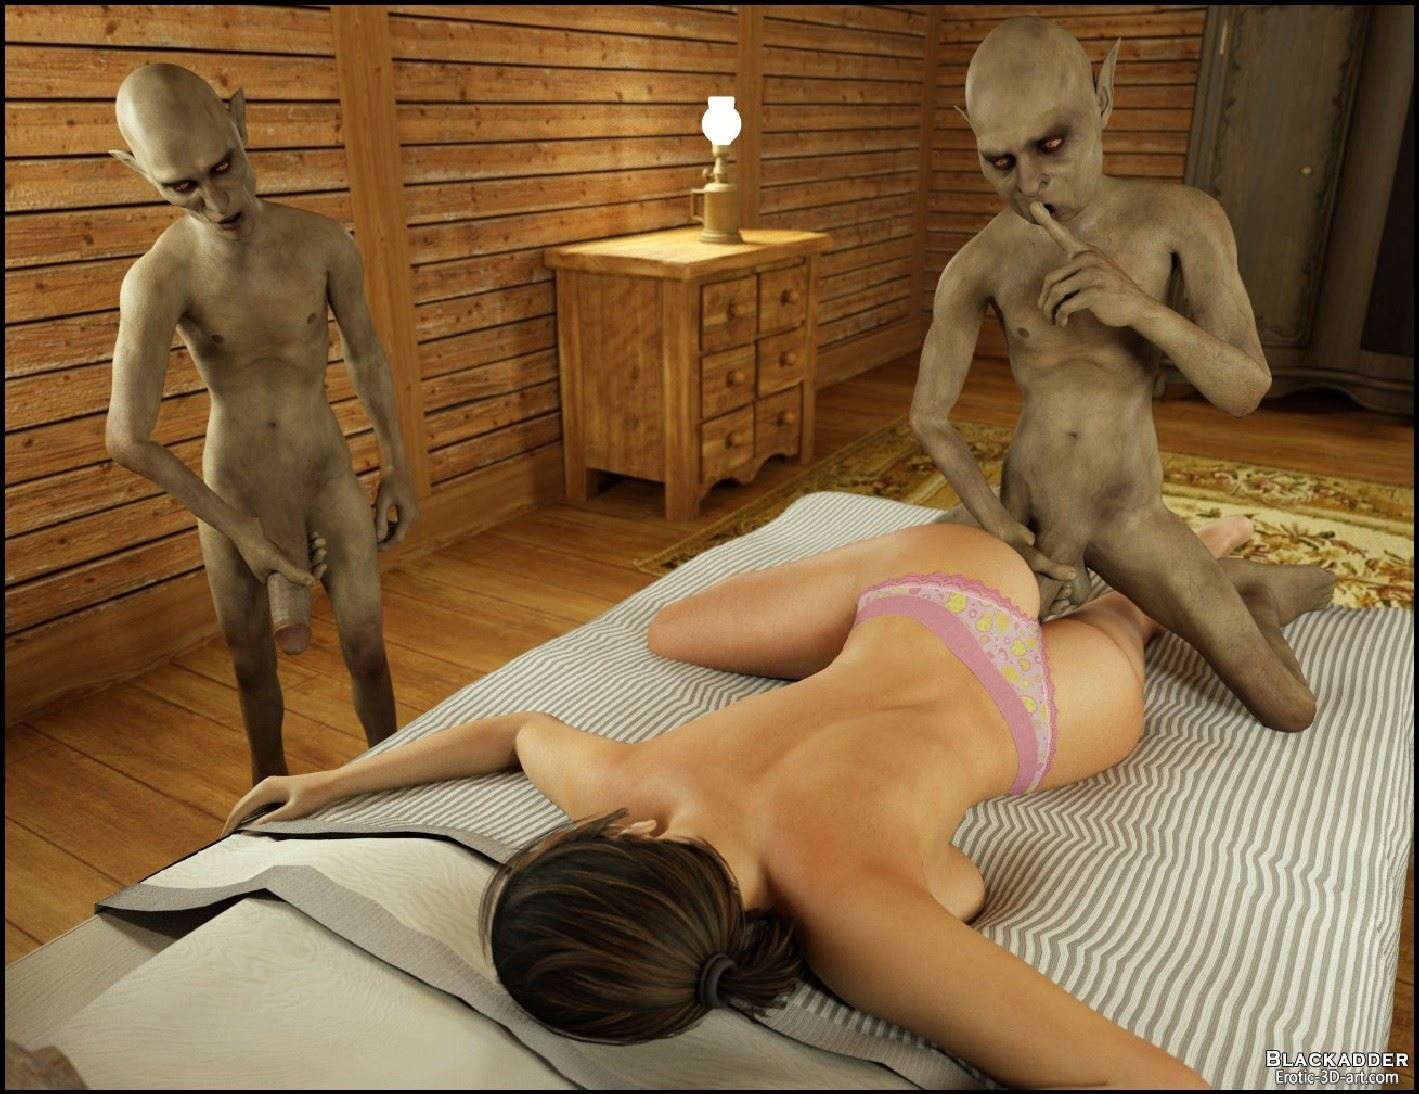 3d porn monster archeolog naked pics